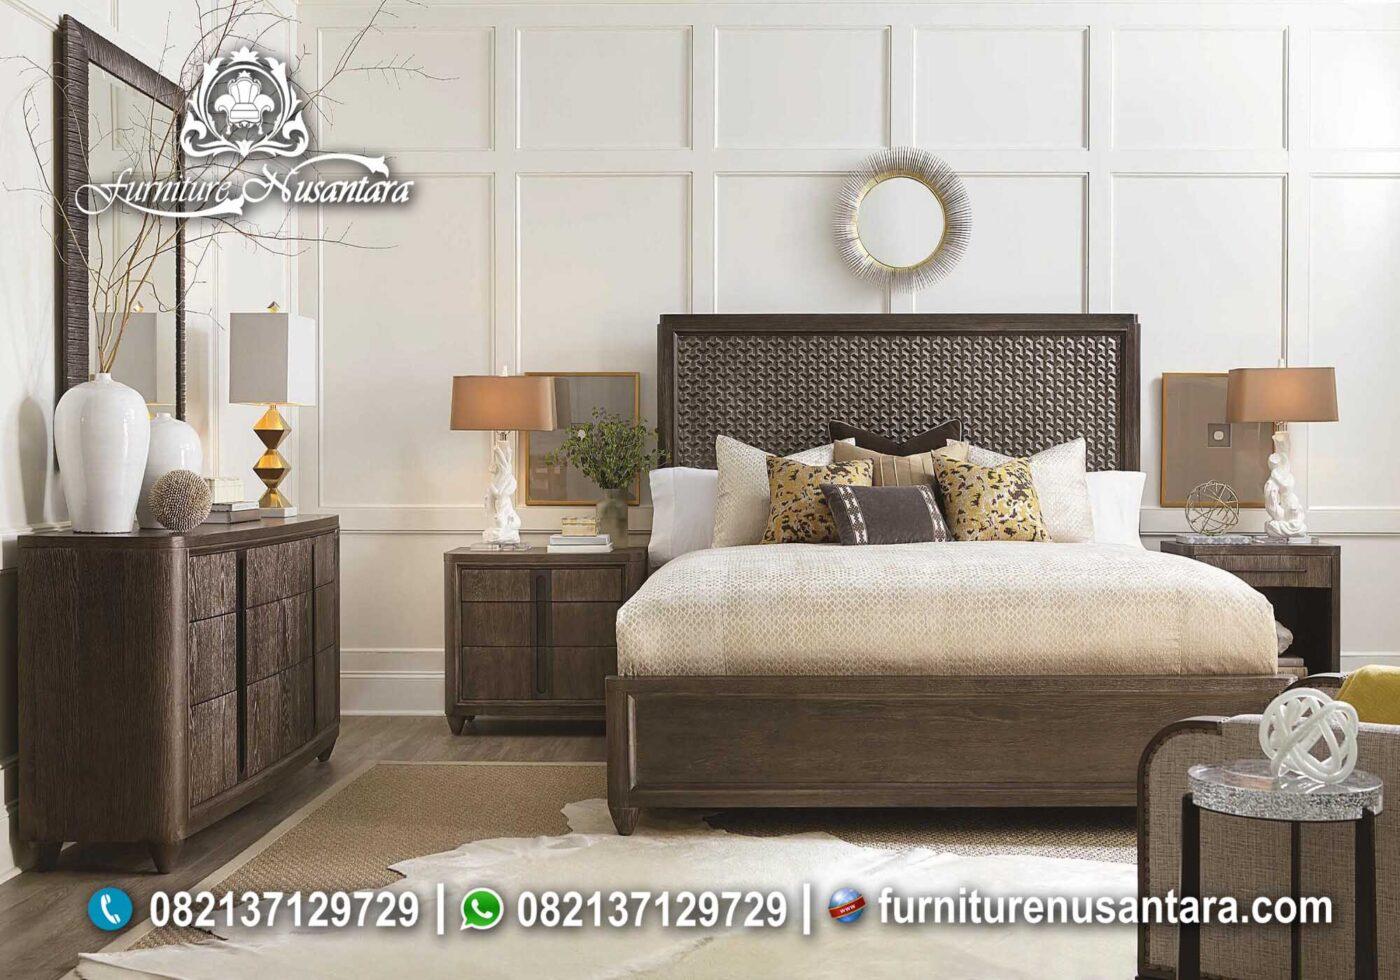 Jual Tempat Tidur Jati Murah KS-58, Furniture Nusantara